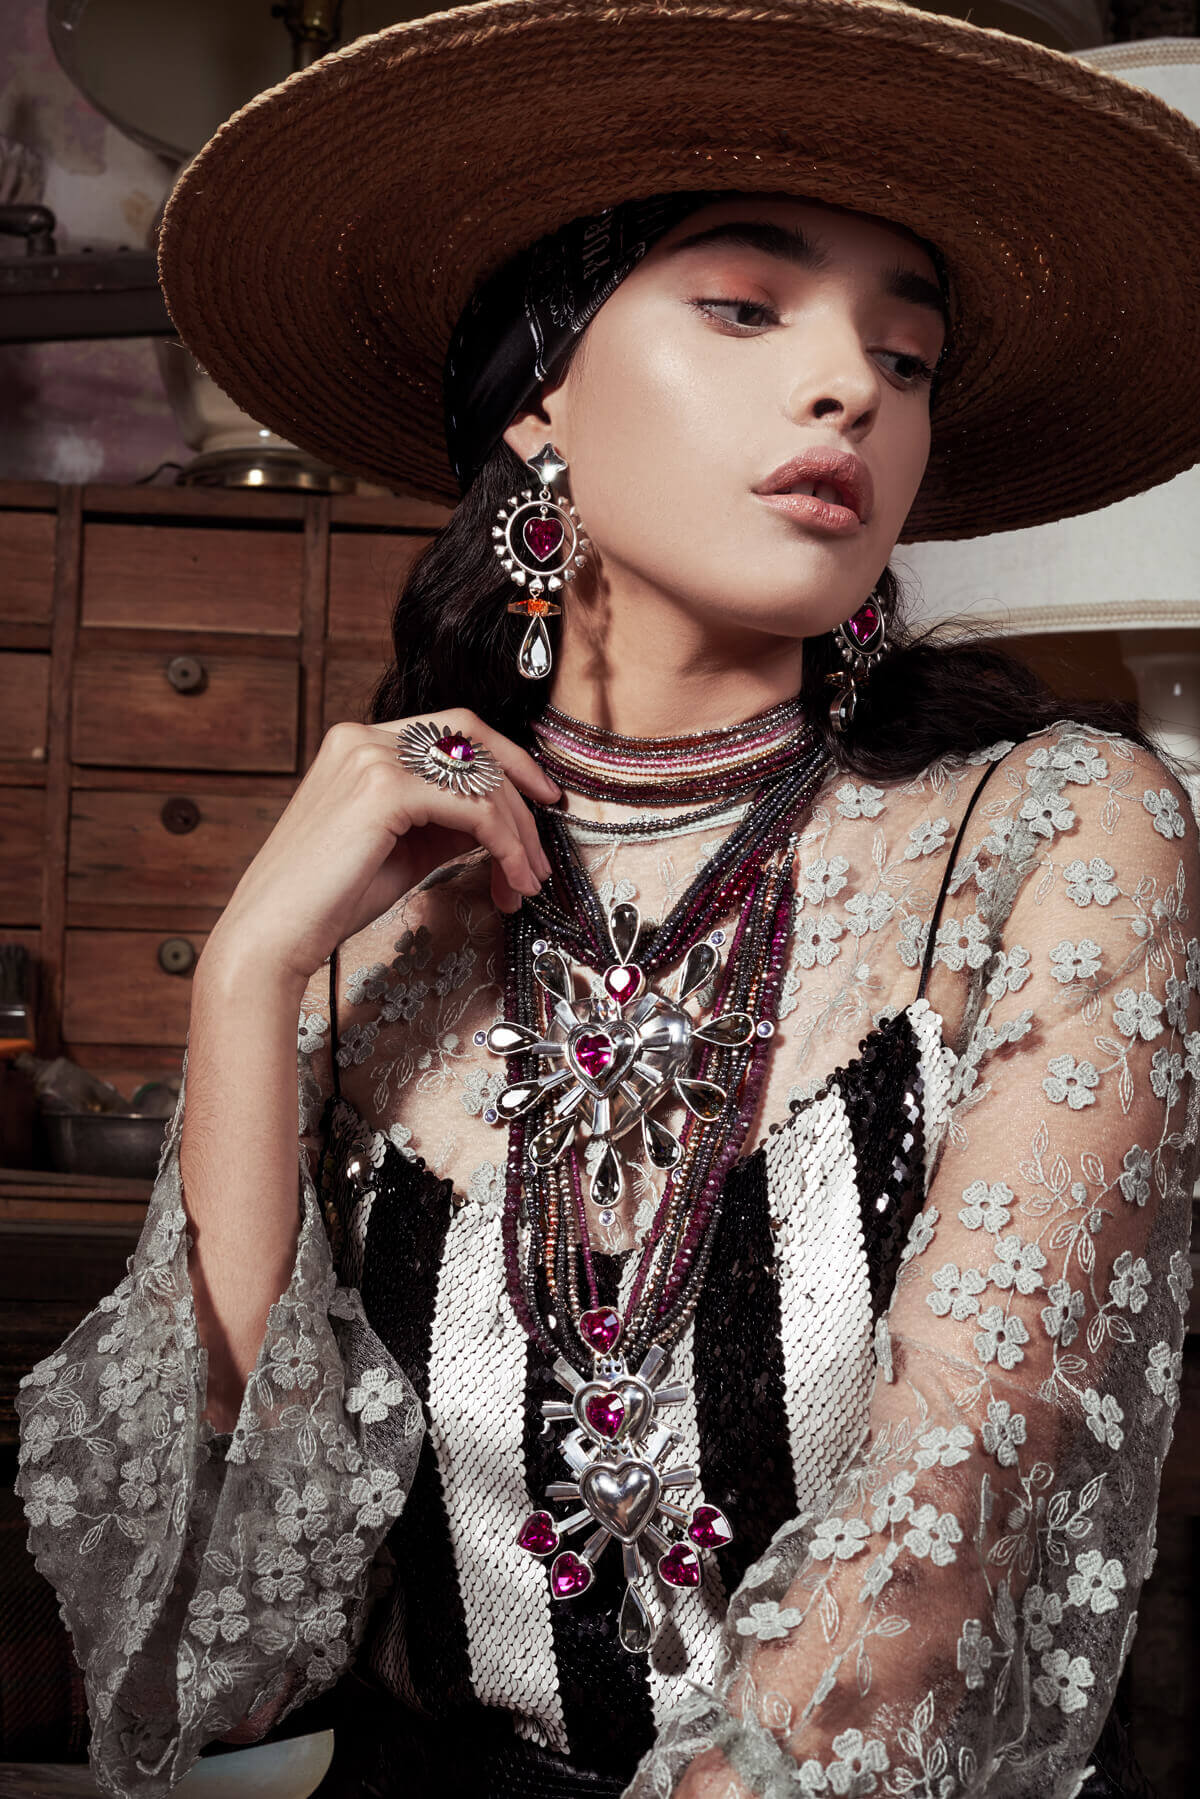 joyas mexicanas gabriela sanchez querido mexico gabriela sanchez 1